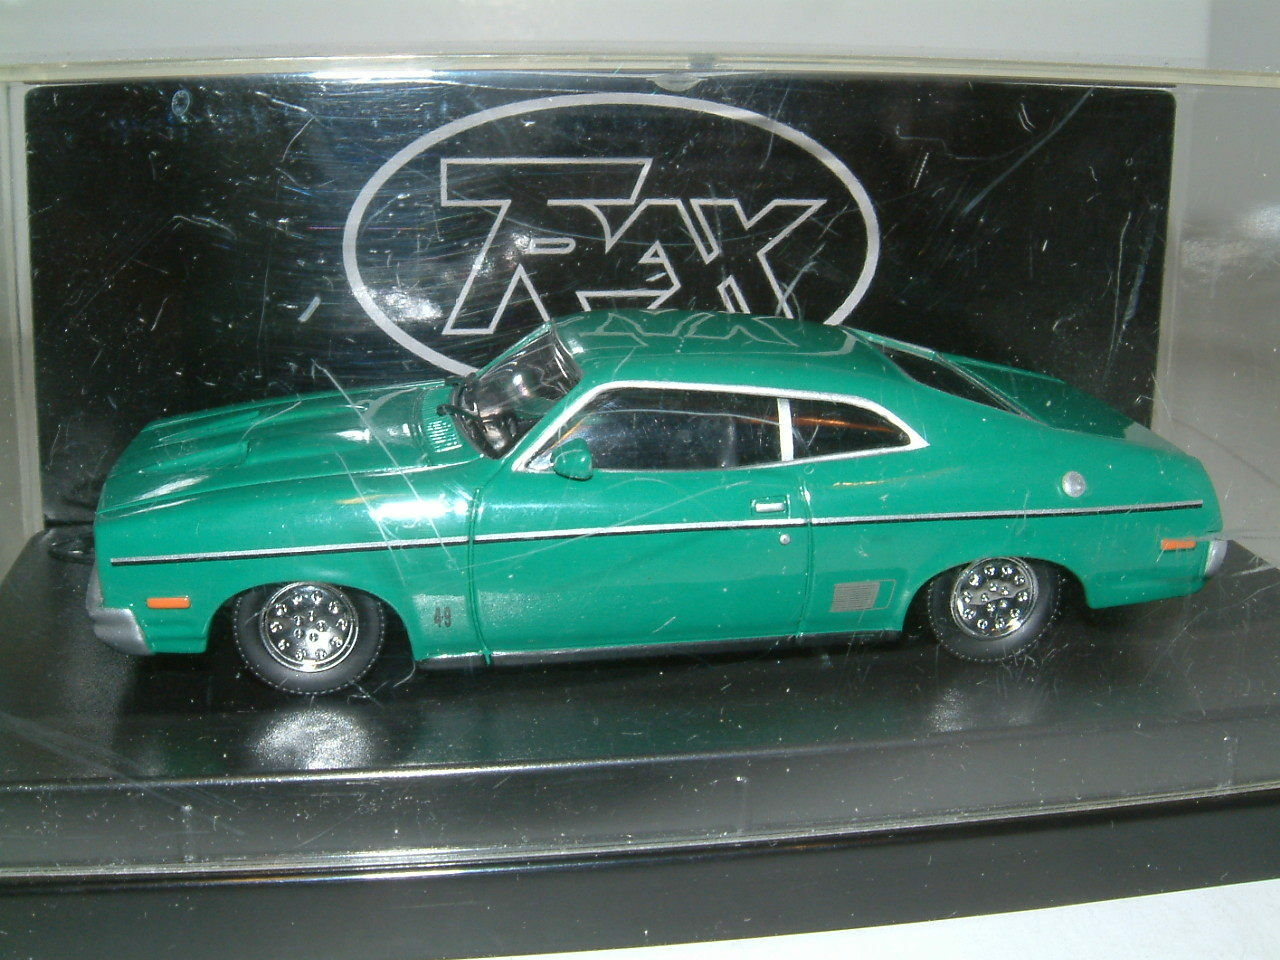 1 43 TRAX TRAX TRAX 1976 FORD XC FALCON GS HARDTOP IN GREEN . AUSTRALIA TG 566082